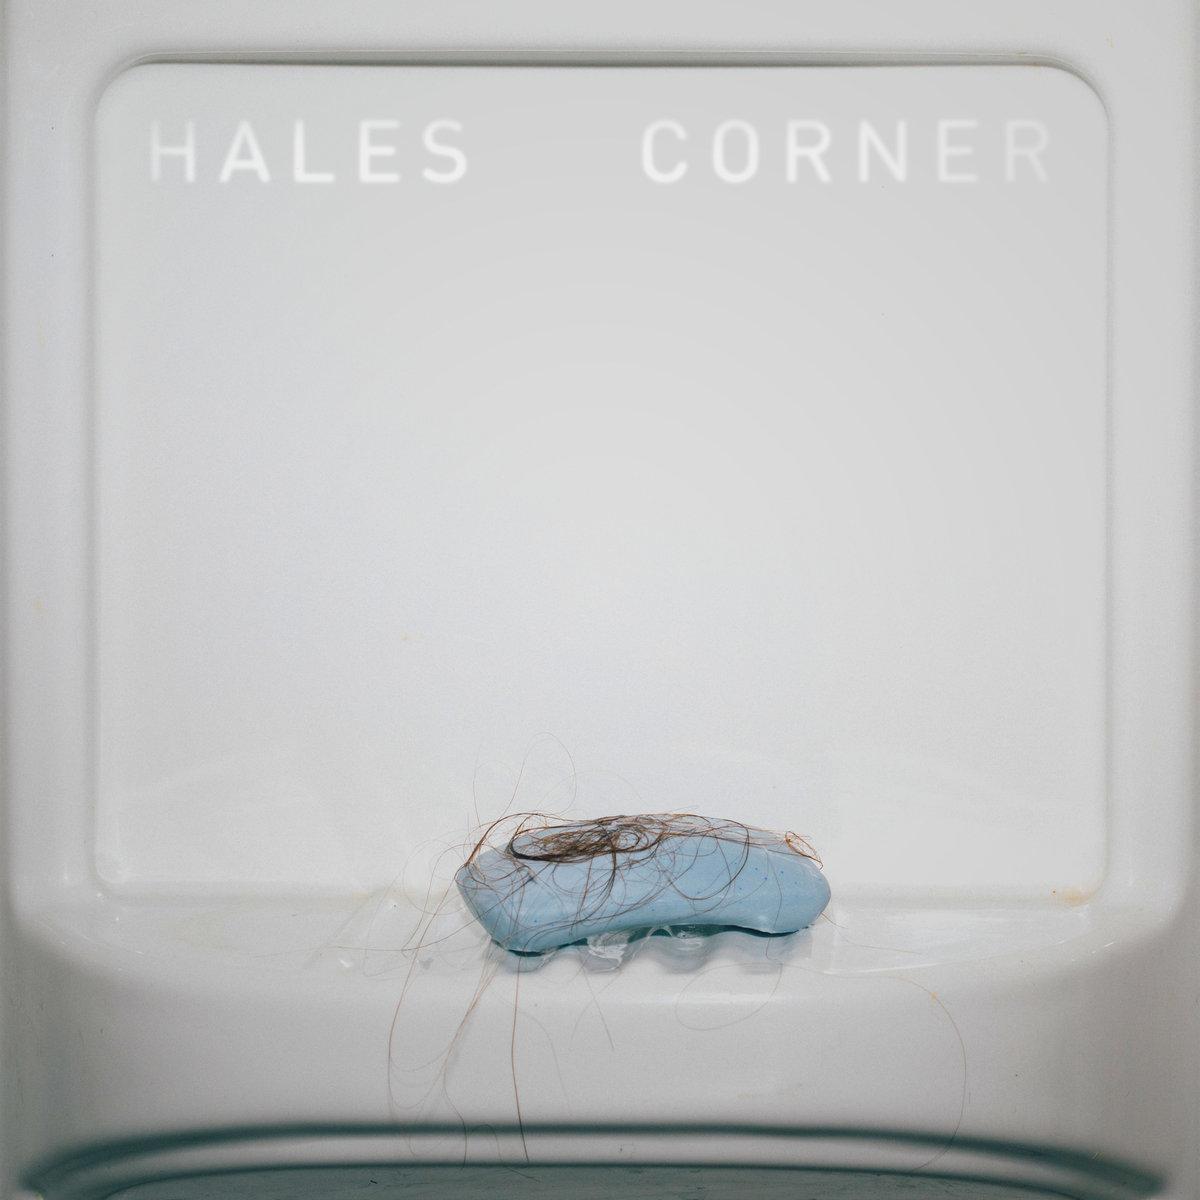 Hales Corner / Hales Corner(CD)